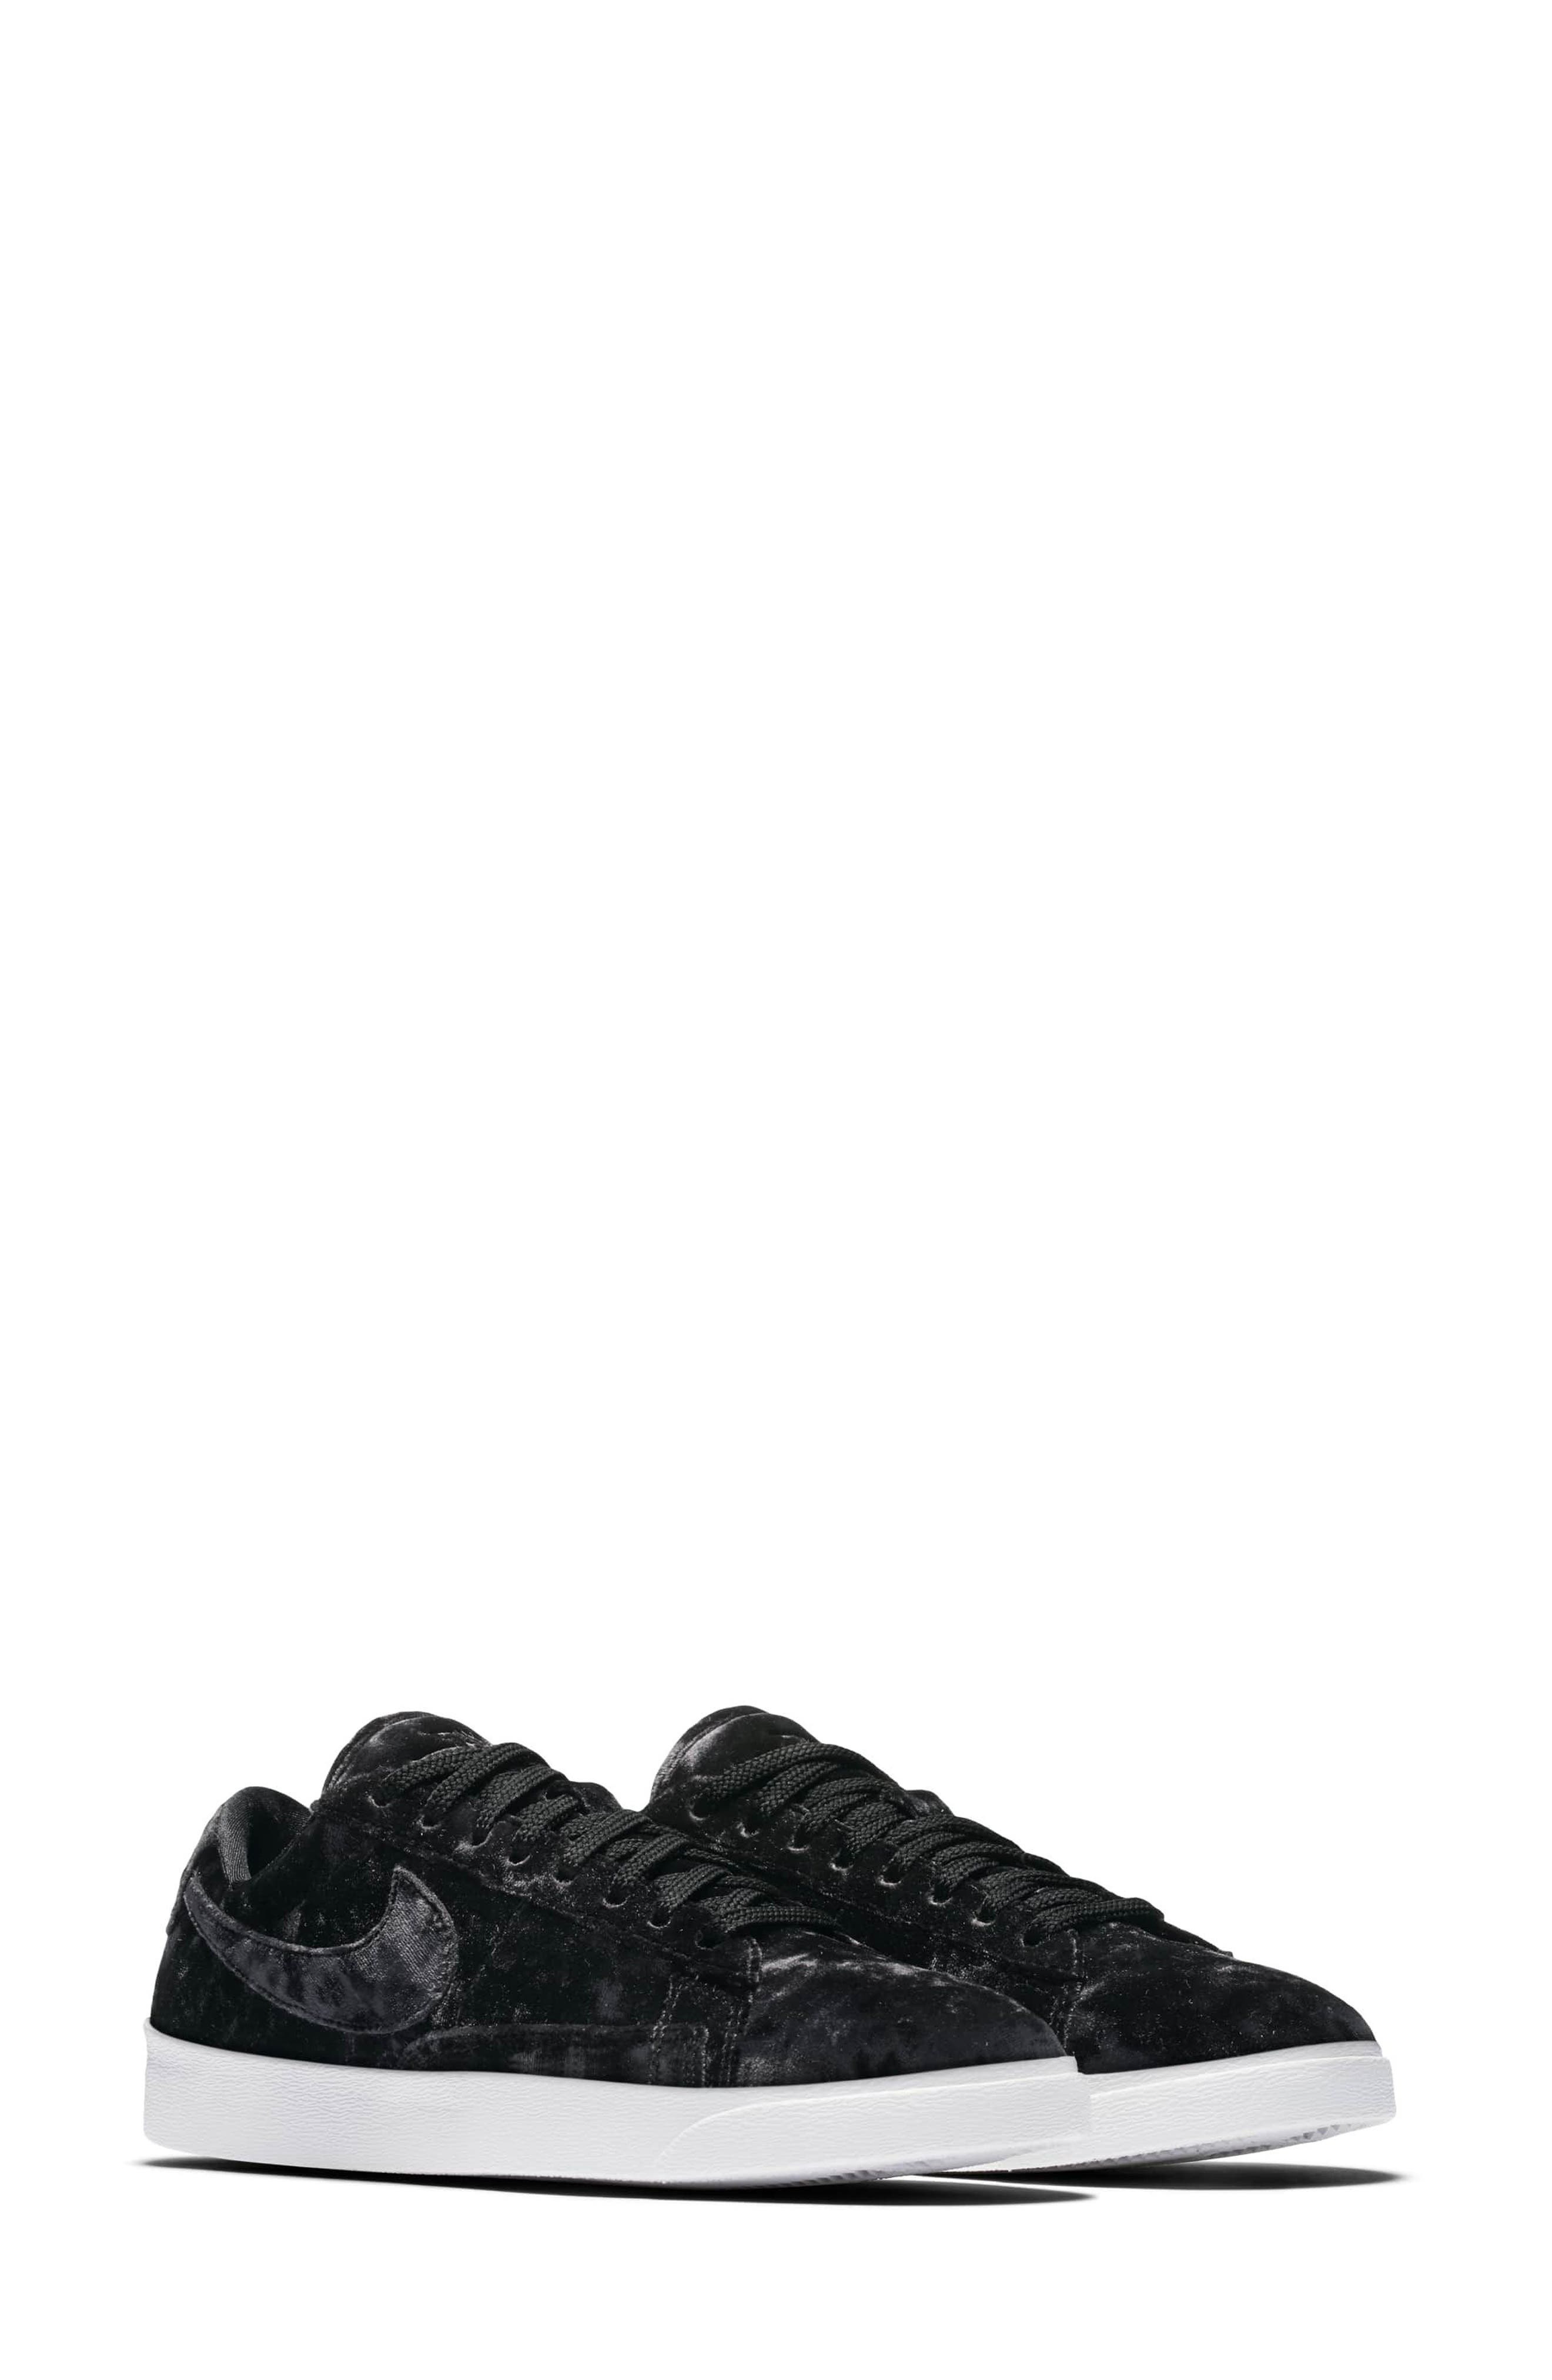 Blazer Low X Sneaker,                         Main,                         color, 003